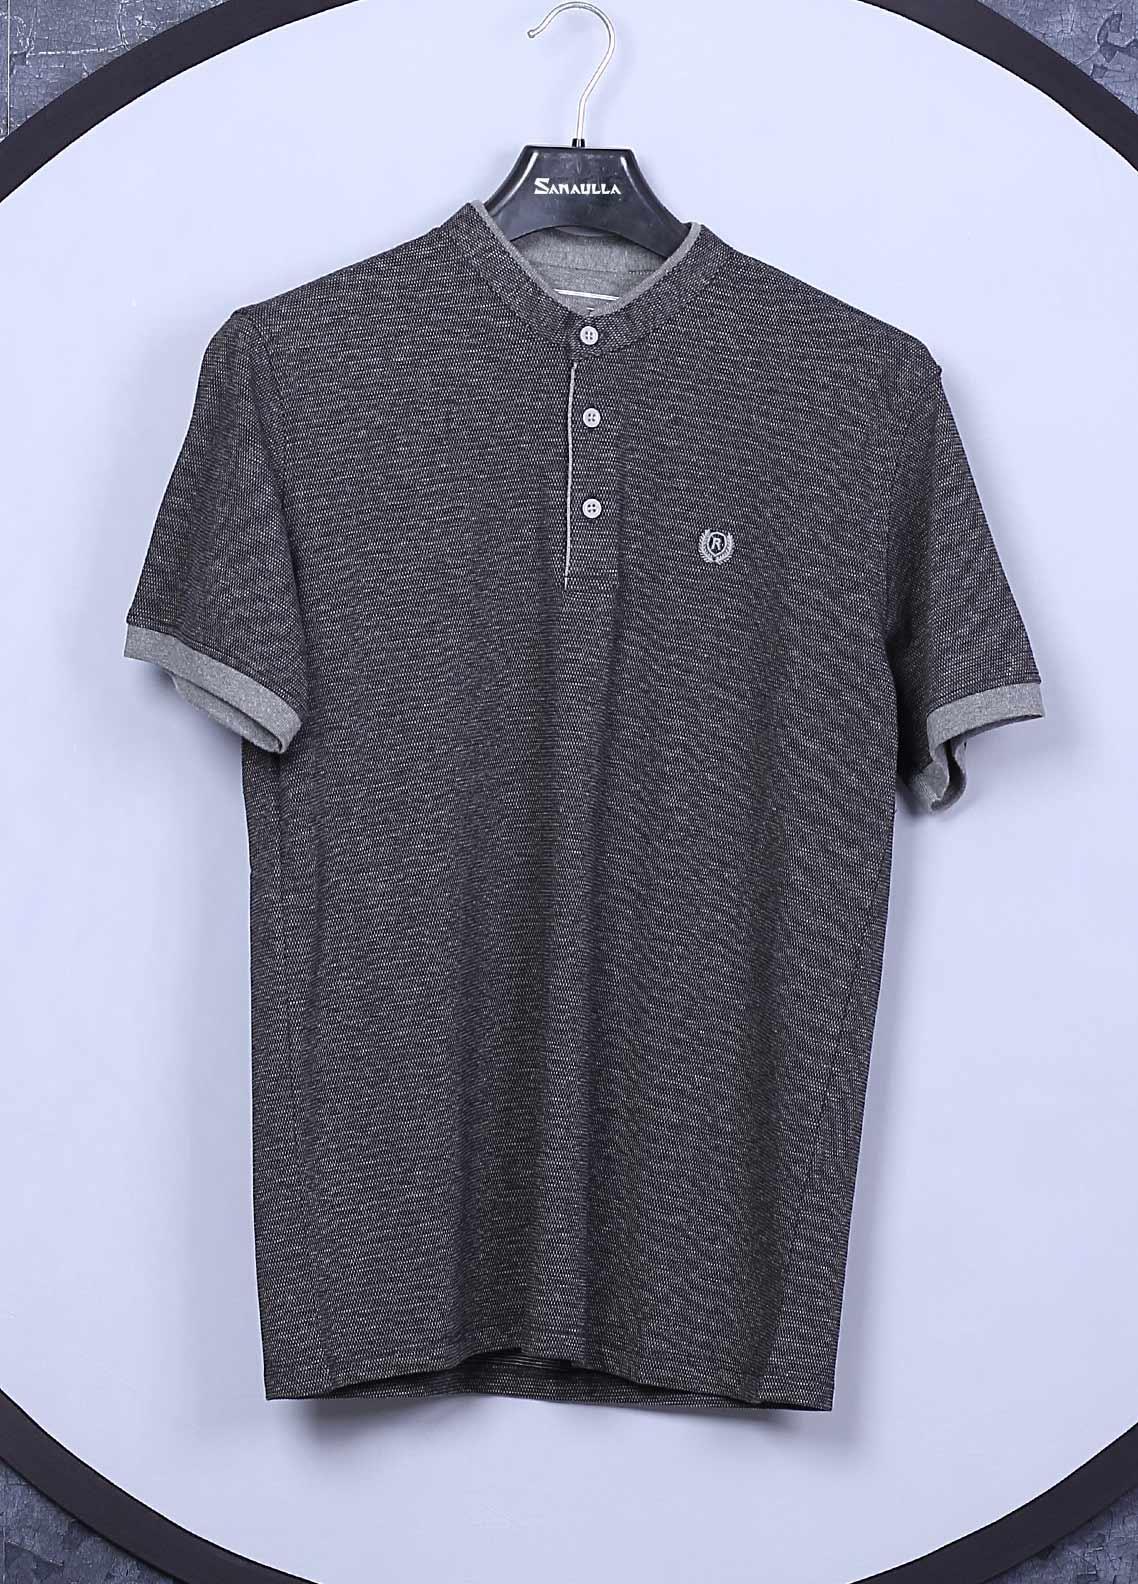 Sanaulla Exclusive Range Cotton Casual T-Shirts for Mens -  5035 Dark Grey